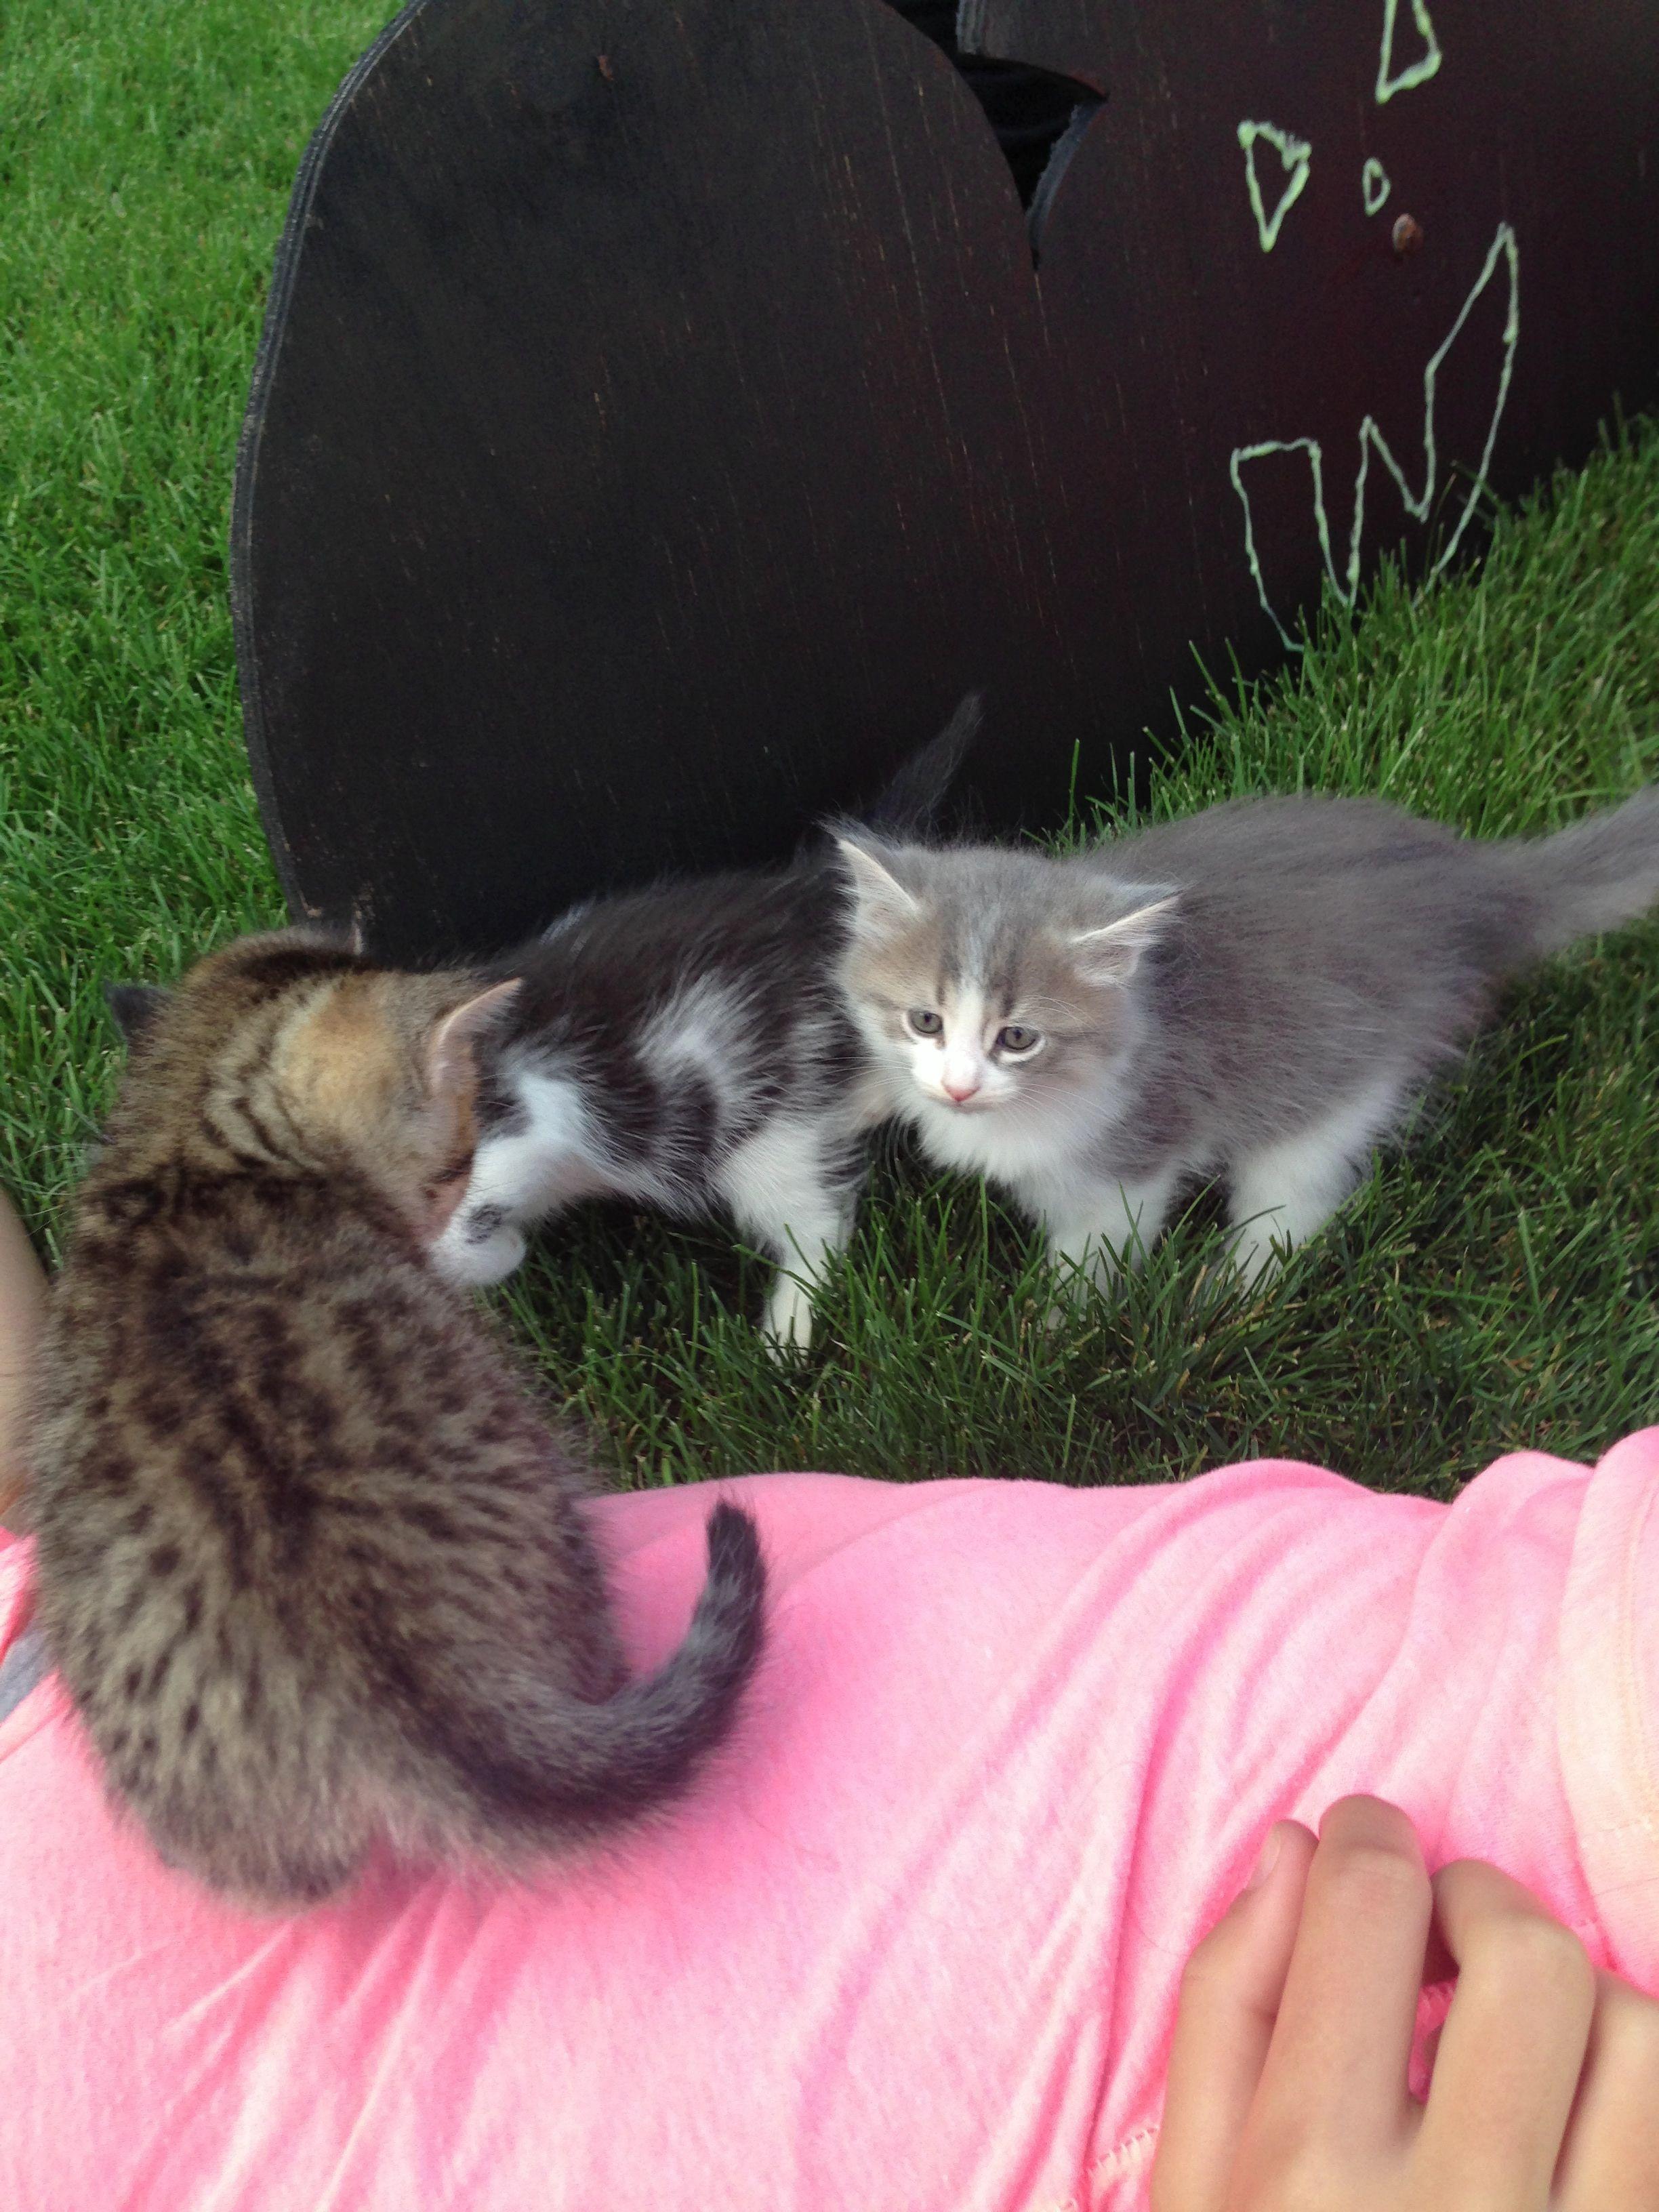 Baby Kittens Baby Kittens Kittens Animals